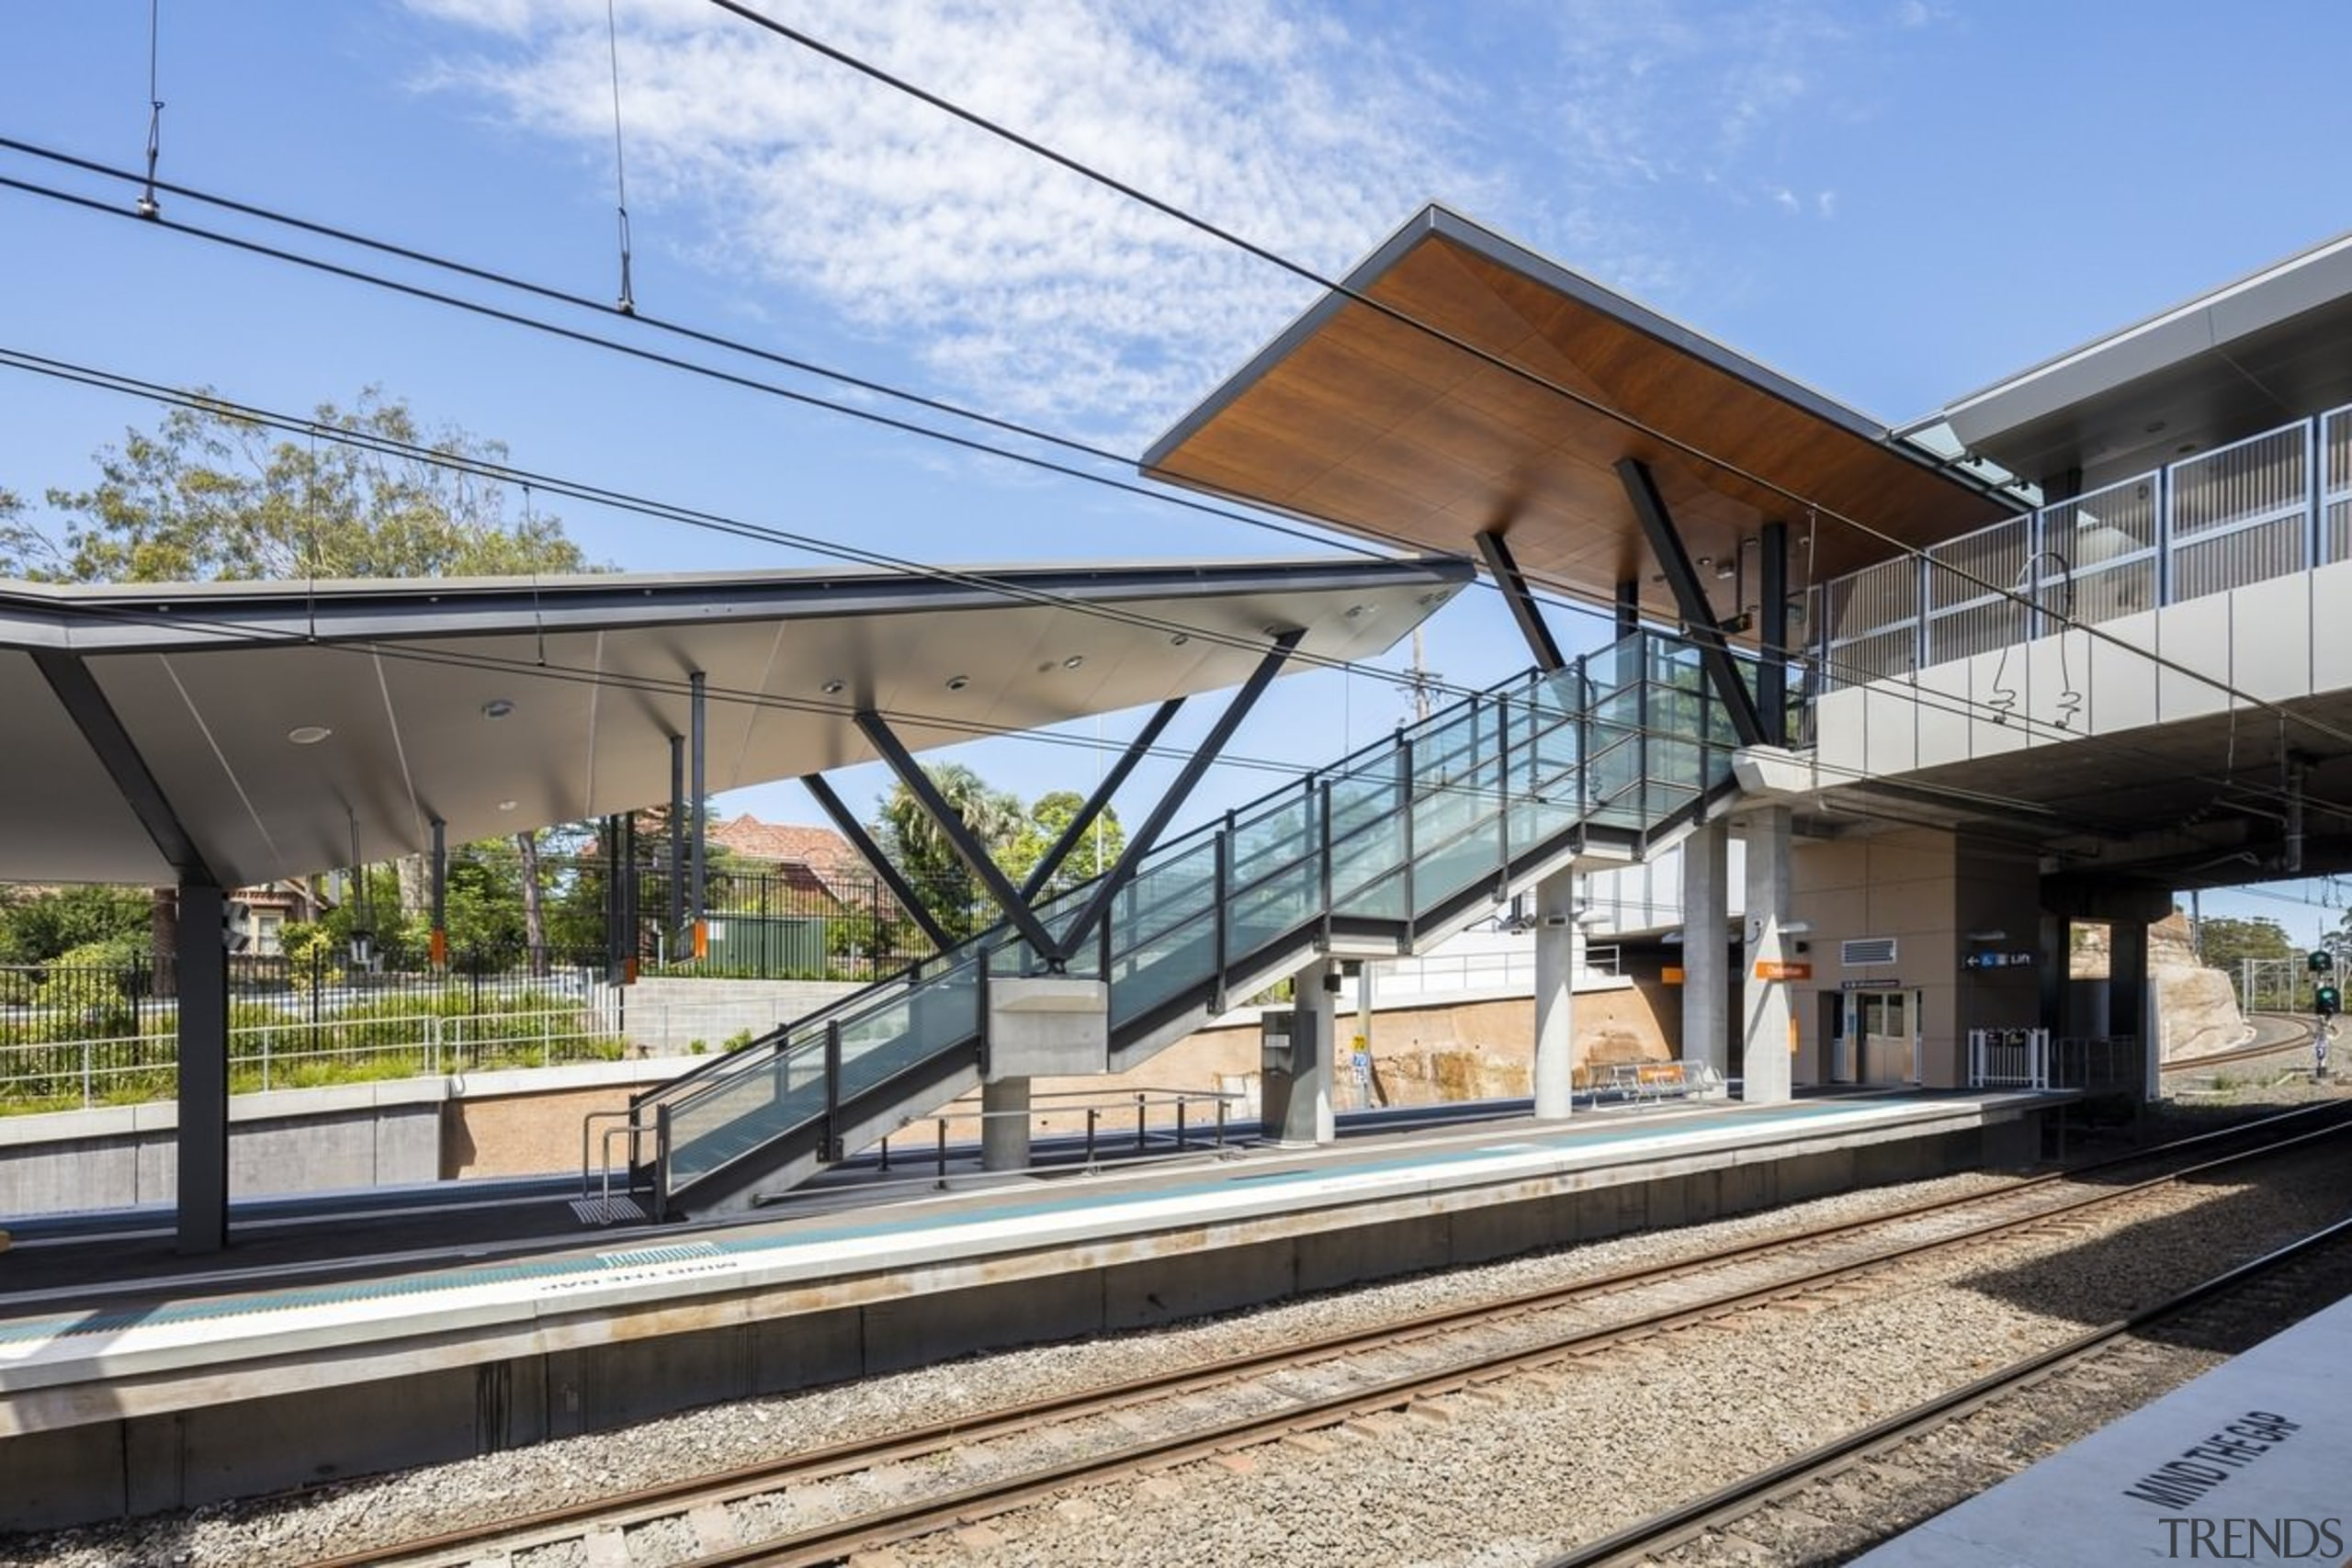 Cheltenham Station – Cox Architecture - Cheltenham Station architecture, building, metropolitan area, residential area, train station, transport, gray, teal